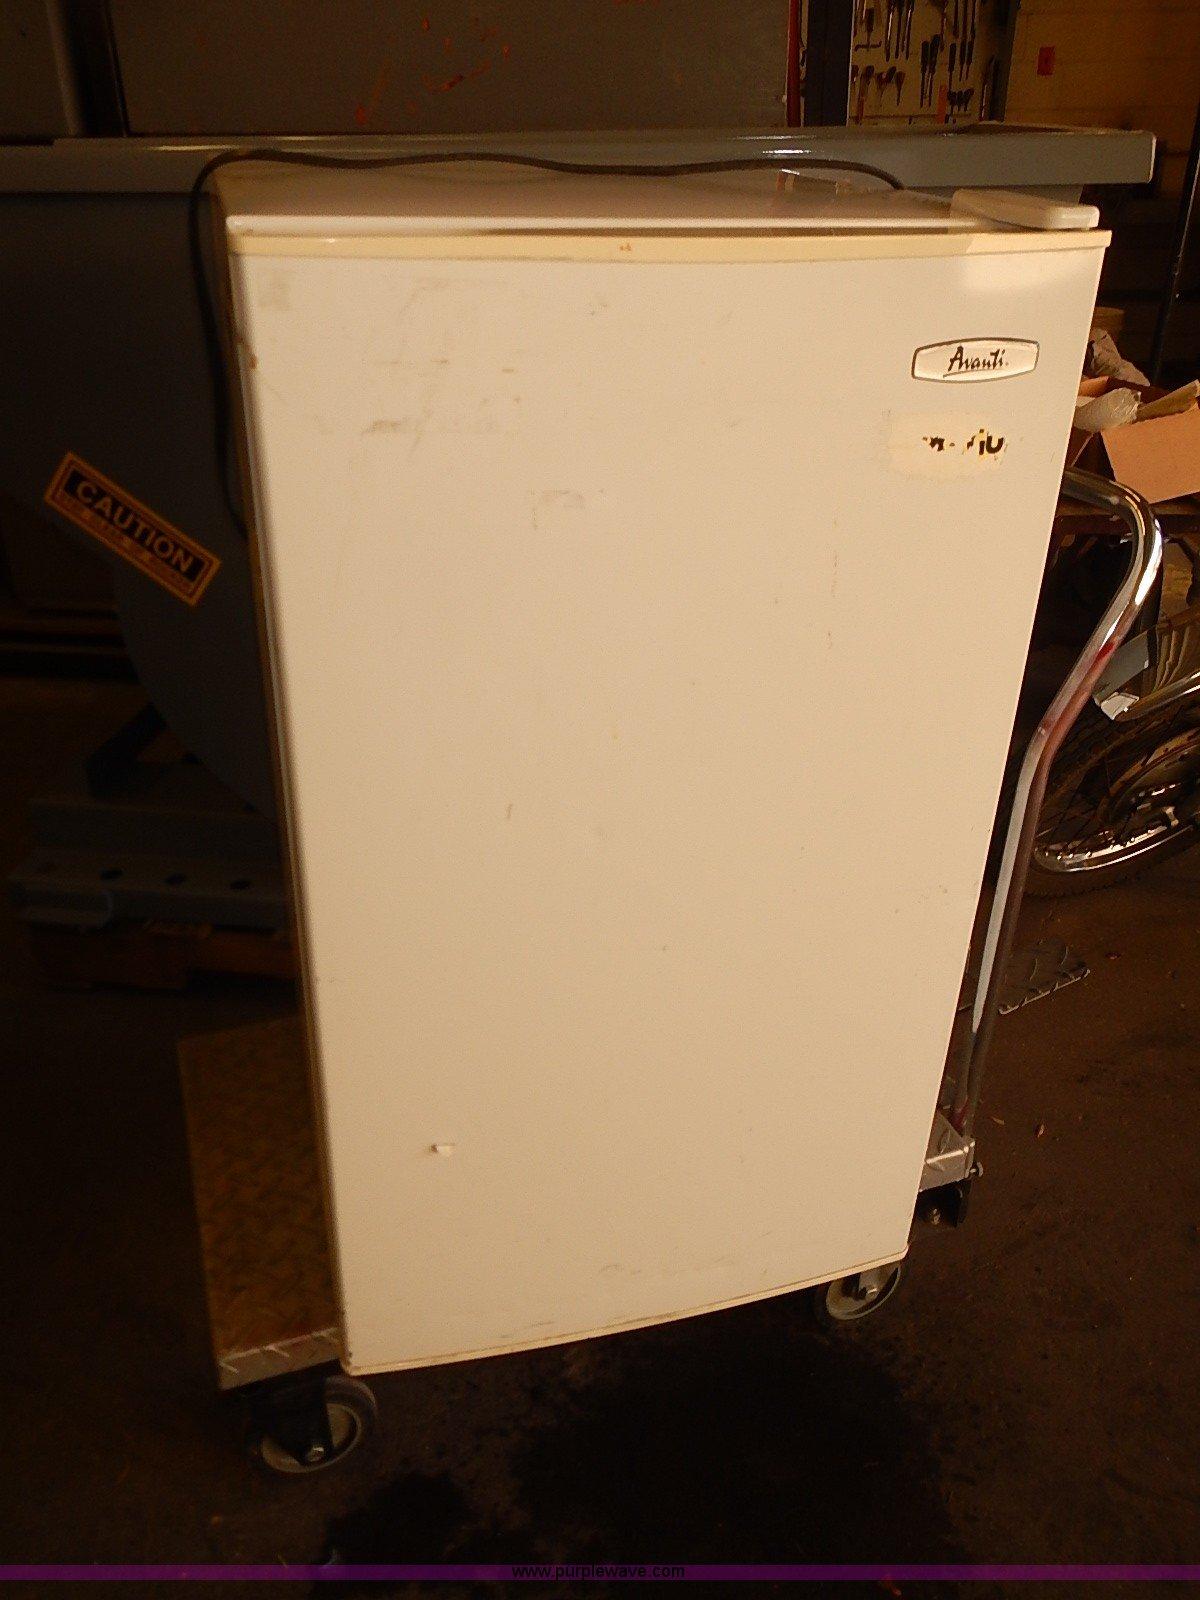 Avanti 440yw Mini Refrigerator And Freezer Item Ba9624 S Wiring Diagram Full Size In New Window